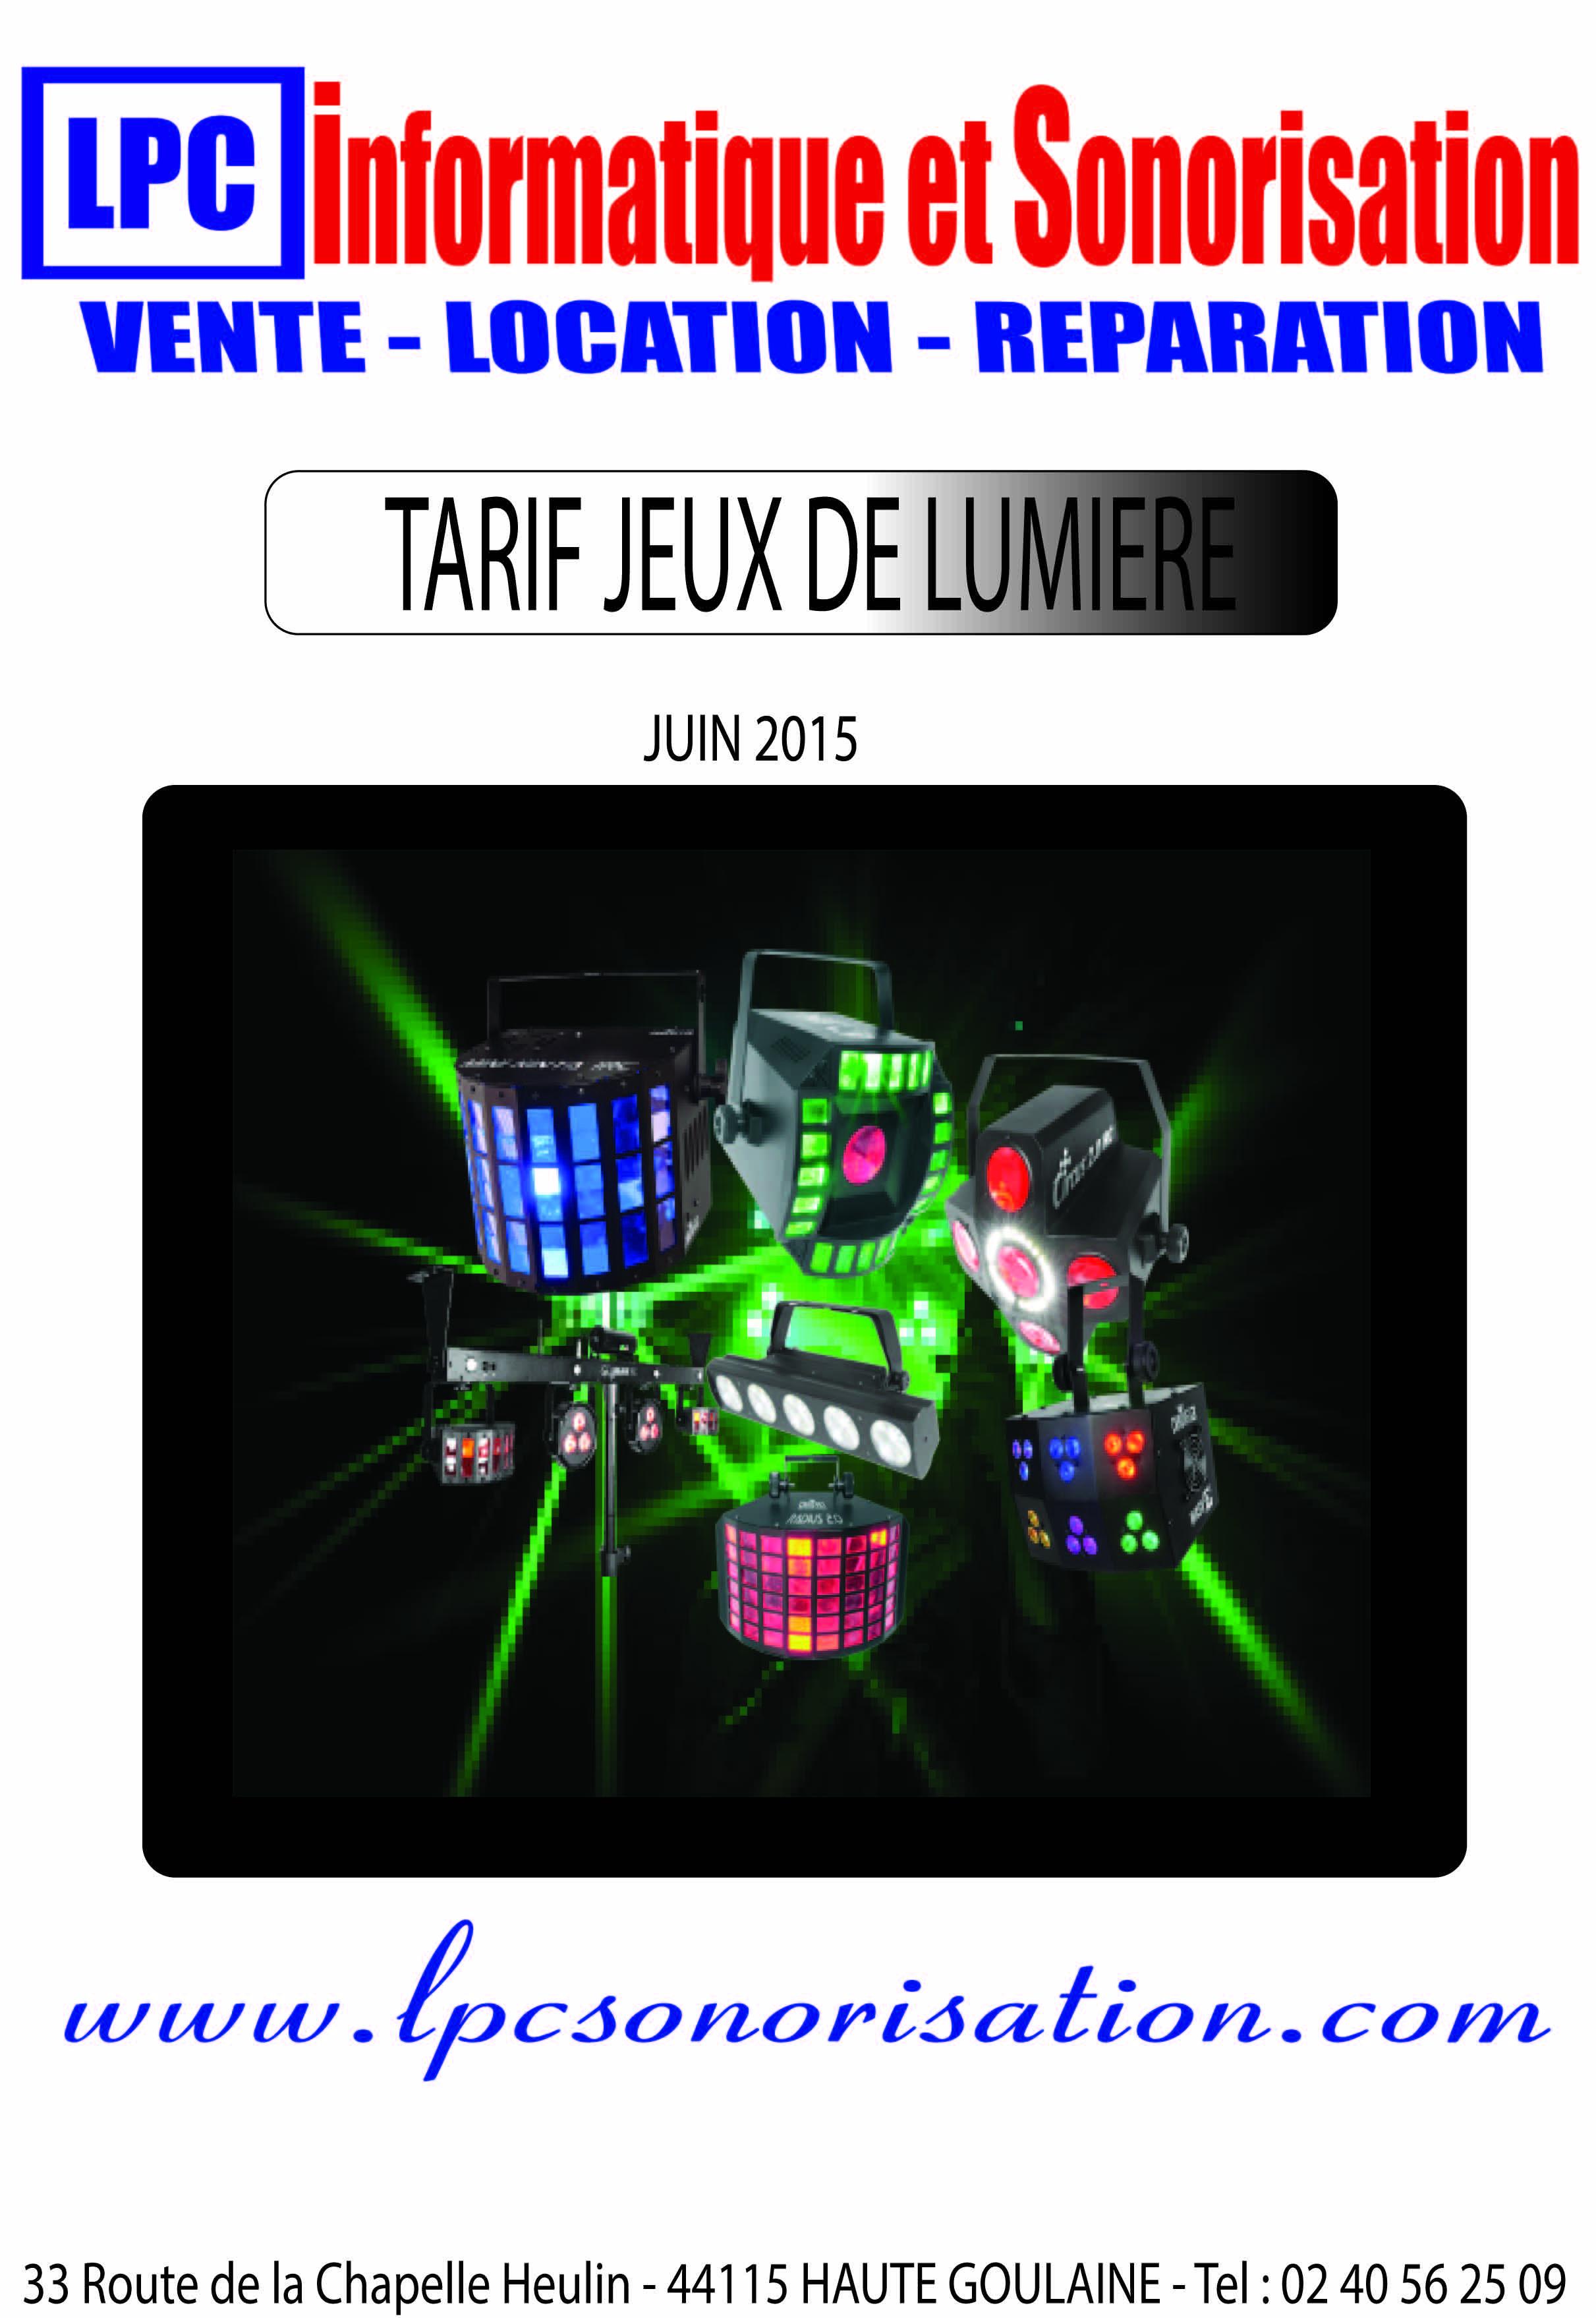 TARIF JEUX LUMIERE JUIN 2015.jpg